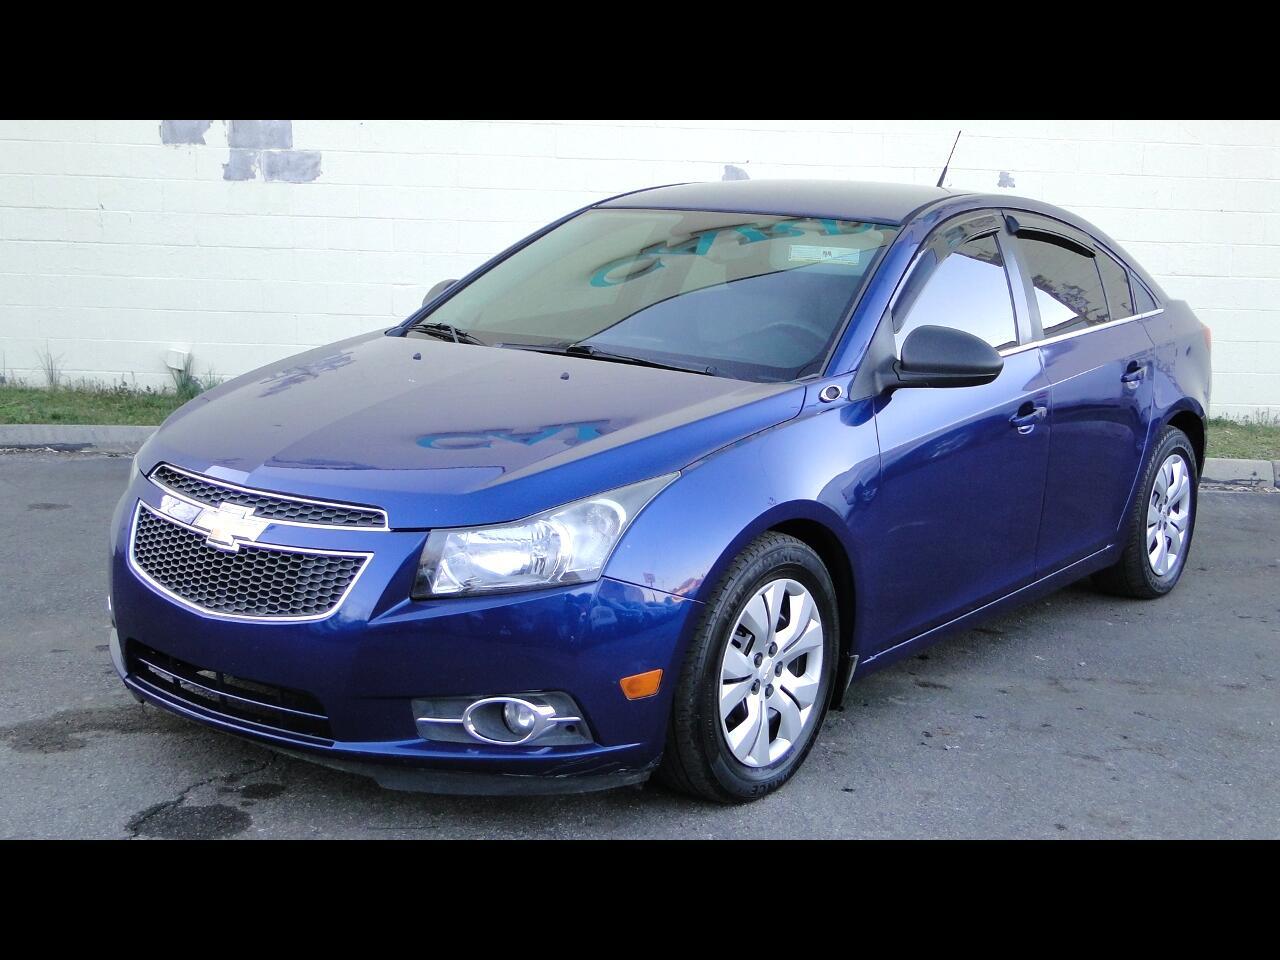 Chevrolet Cruze 2LS 2012